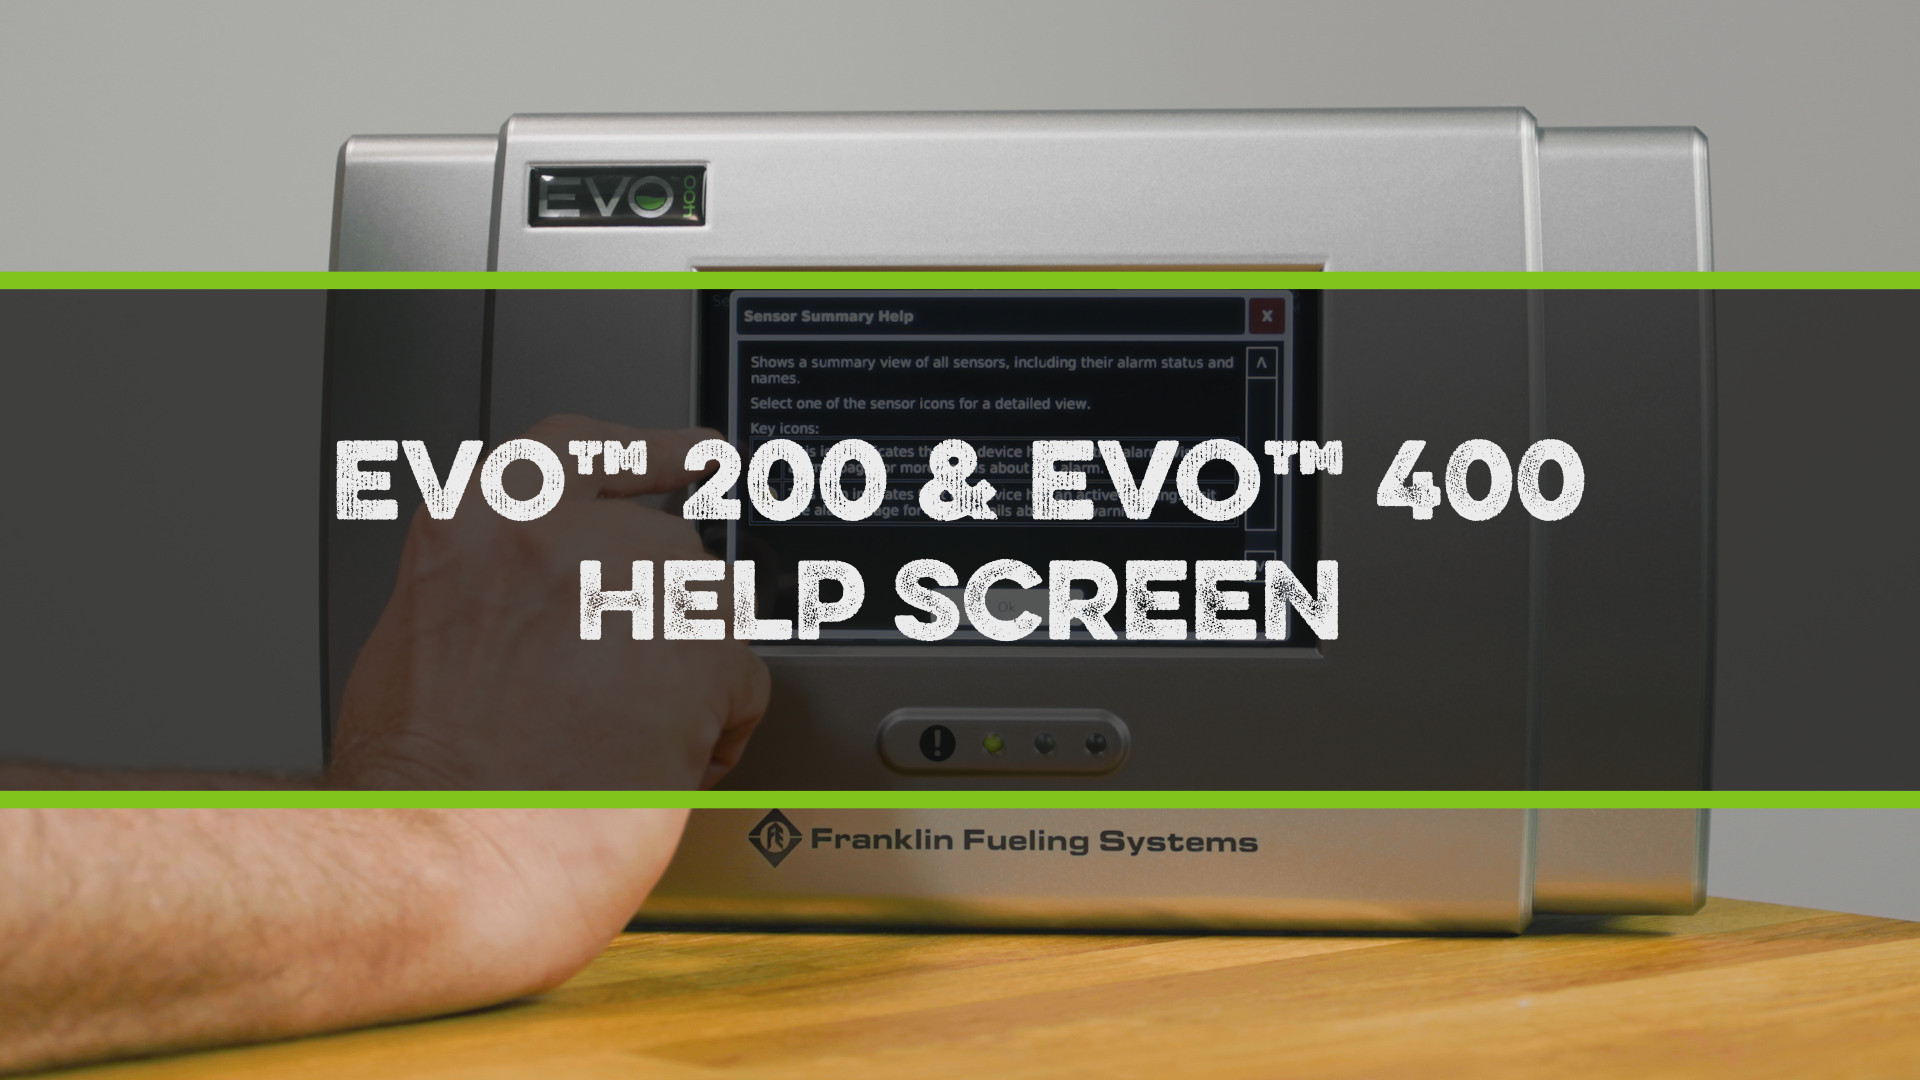 FFS Pro Evo 200-400 Help Screen Video